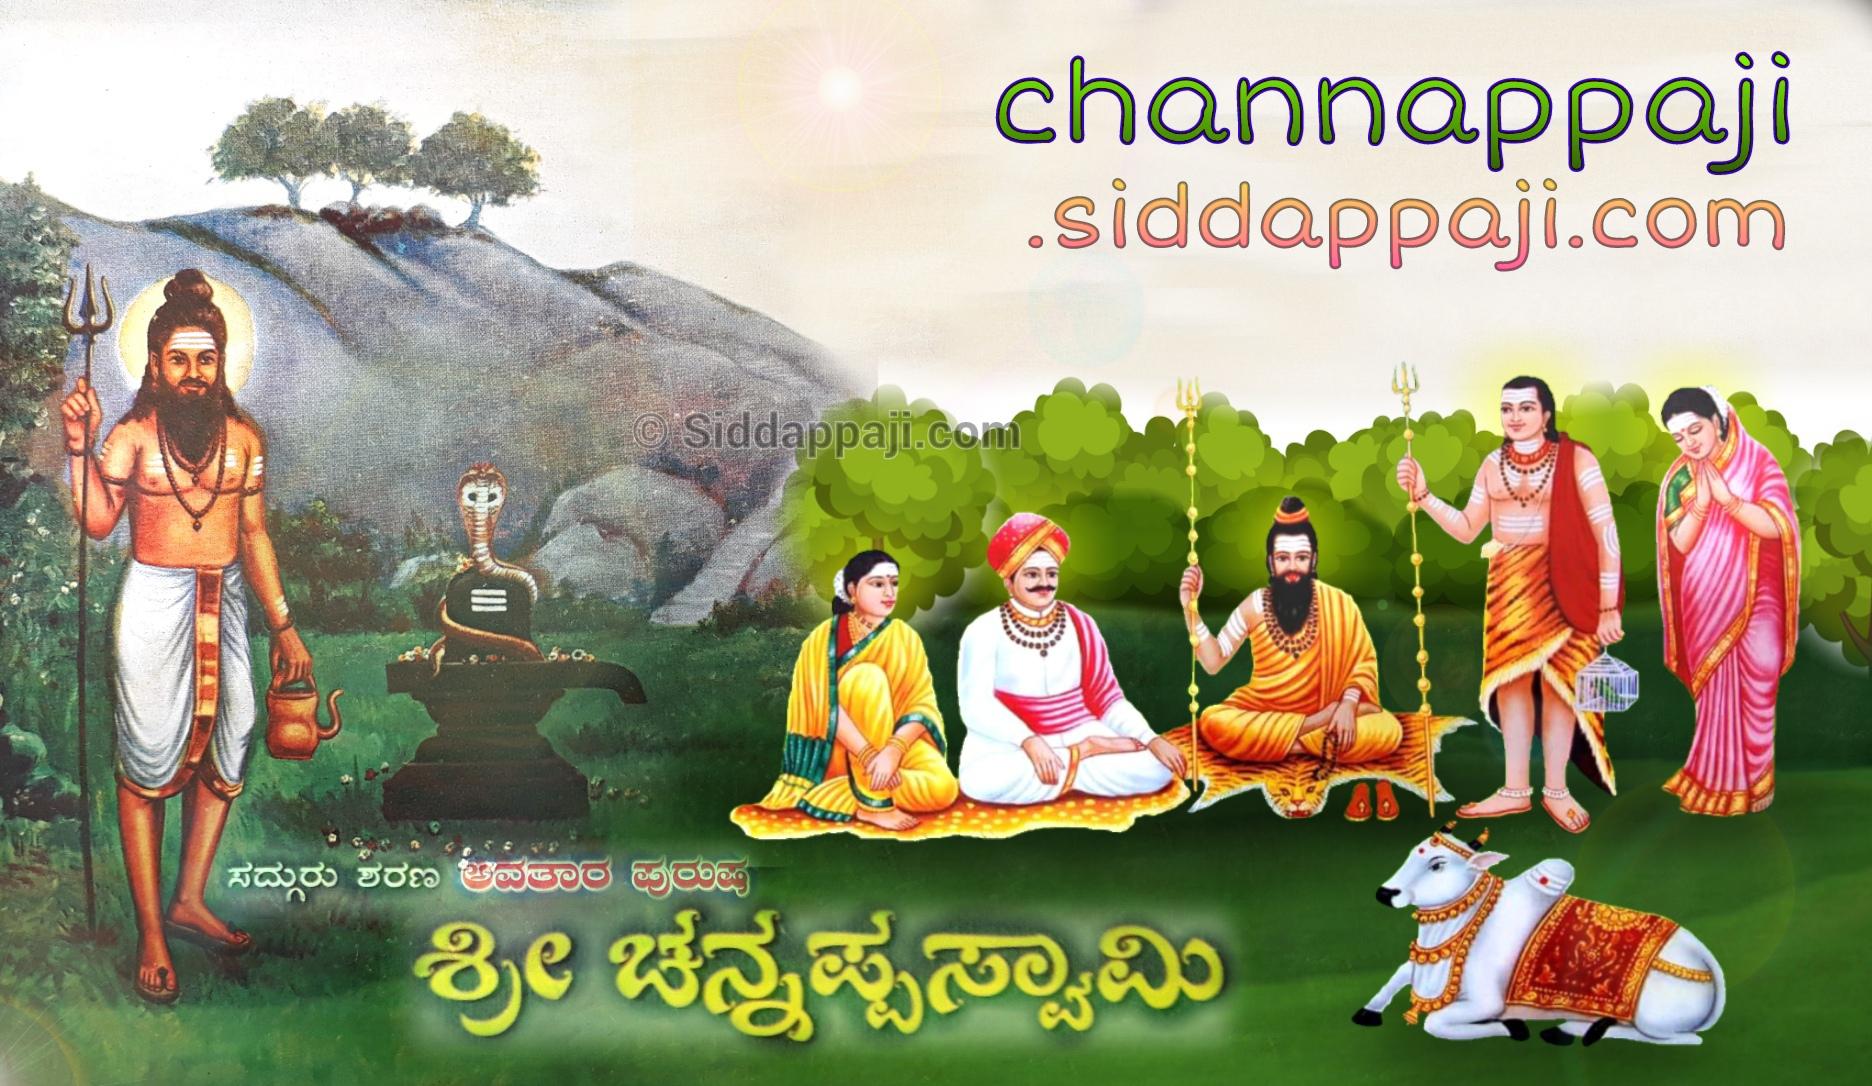 Channappaji.siddappaji.com